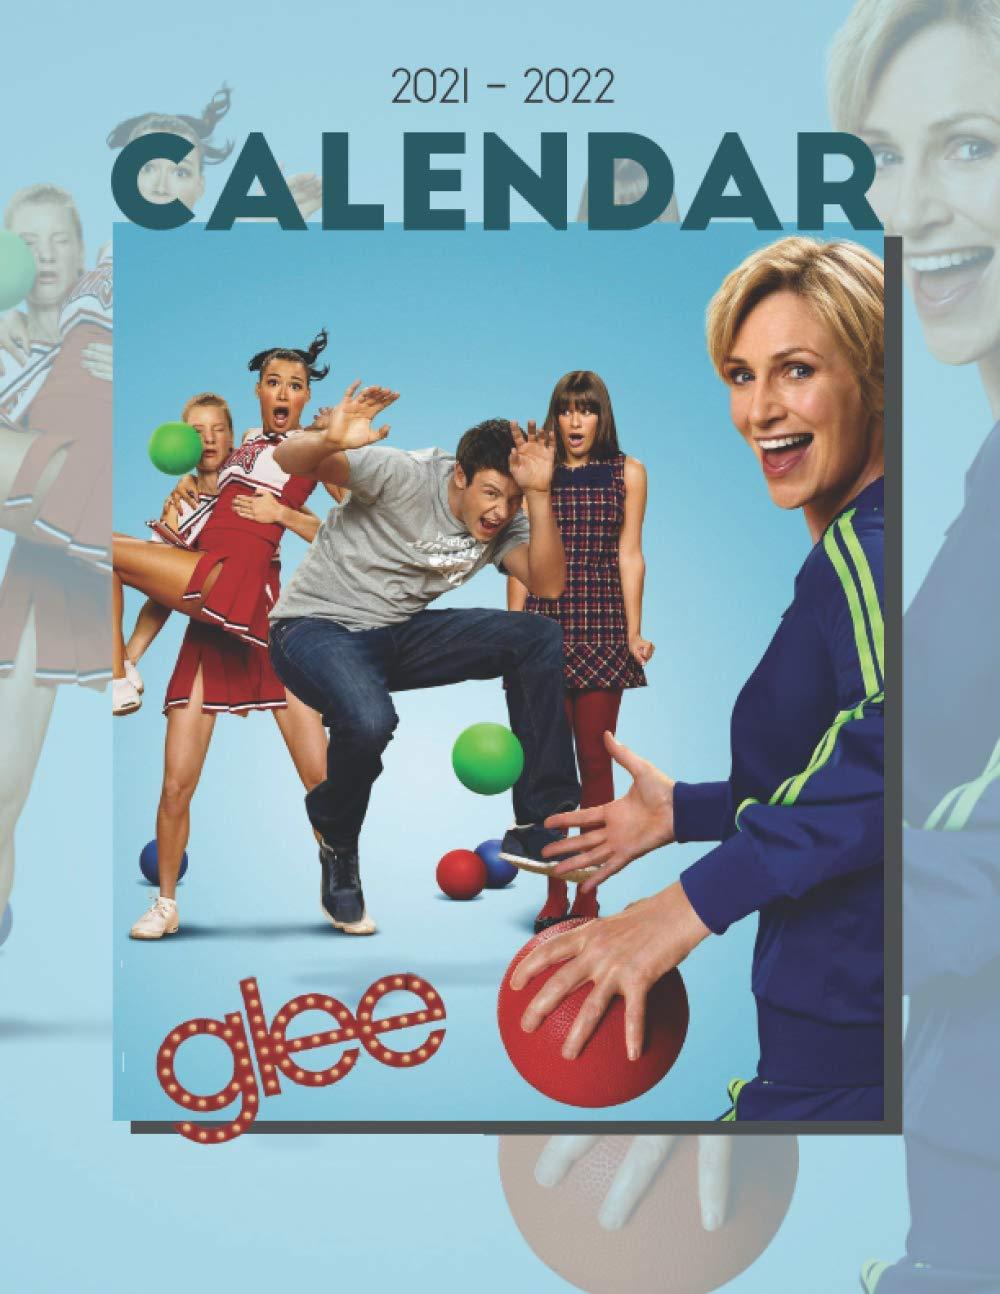 Amazing Calendar 2022.Amazon Com Glee Calendar 2021 2022 Amazing 18 Month Book Calendar 2021 2022 With Size 8 5 X11 9798583386437 Fun Glee Fan Books